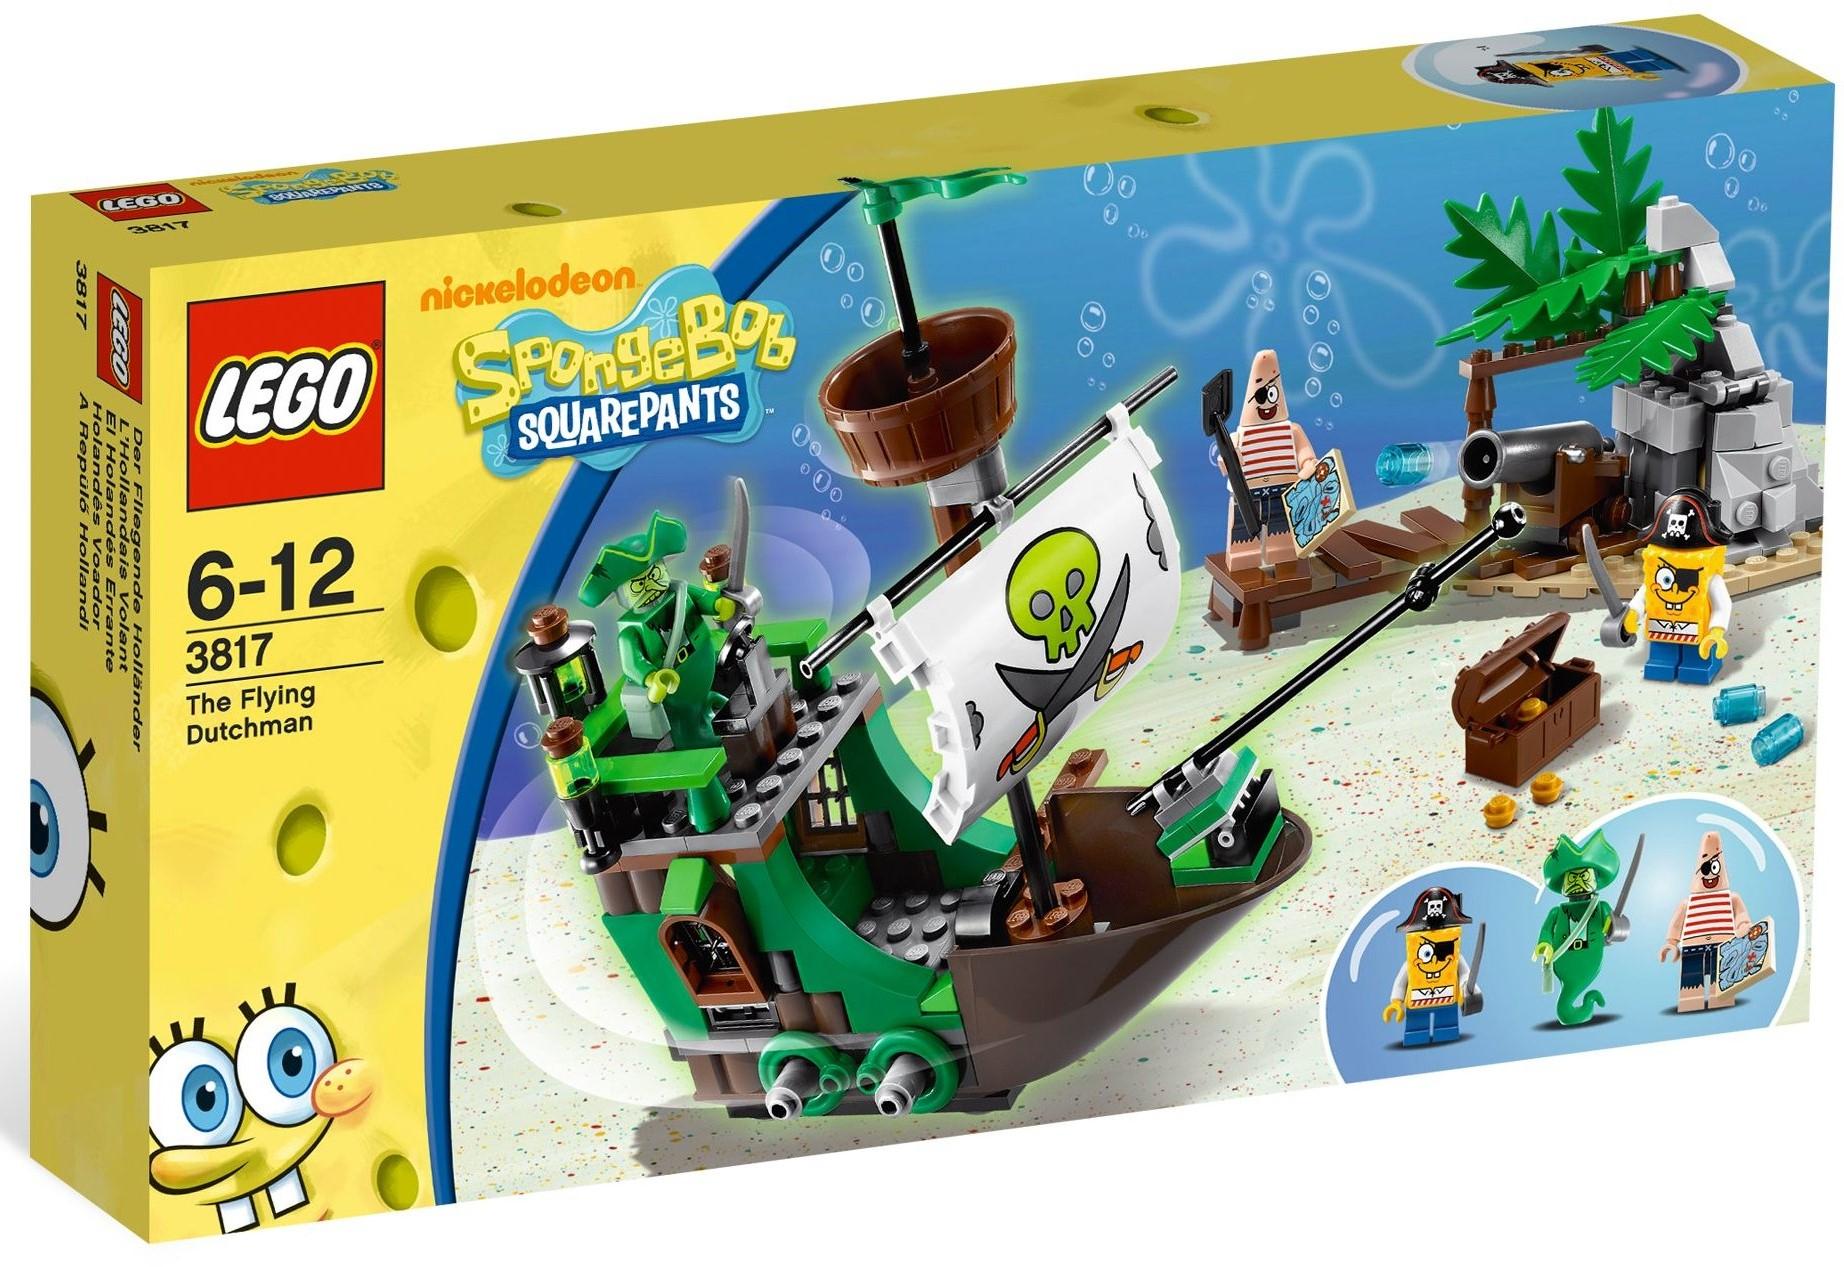 Lego Spongebob The Stranger Themes Under The Sea